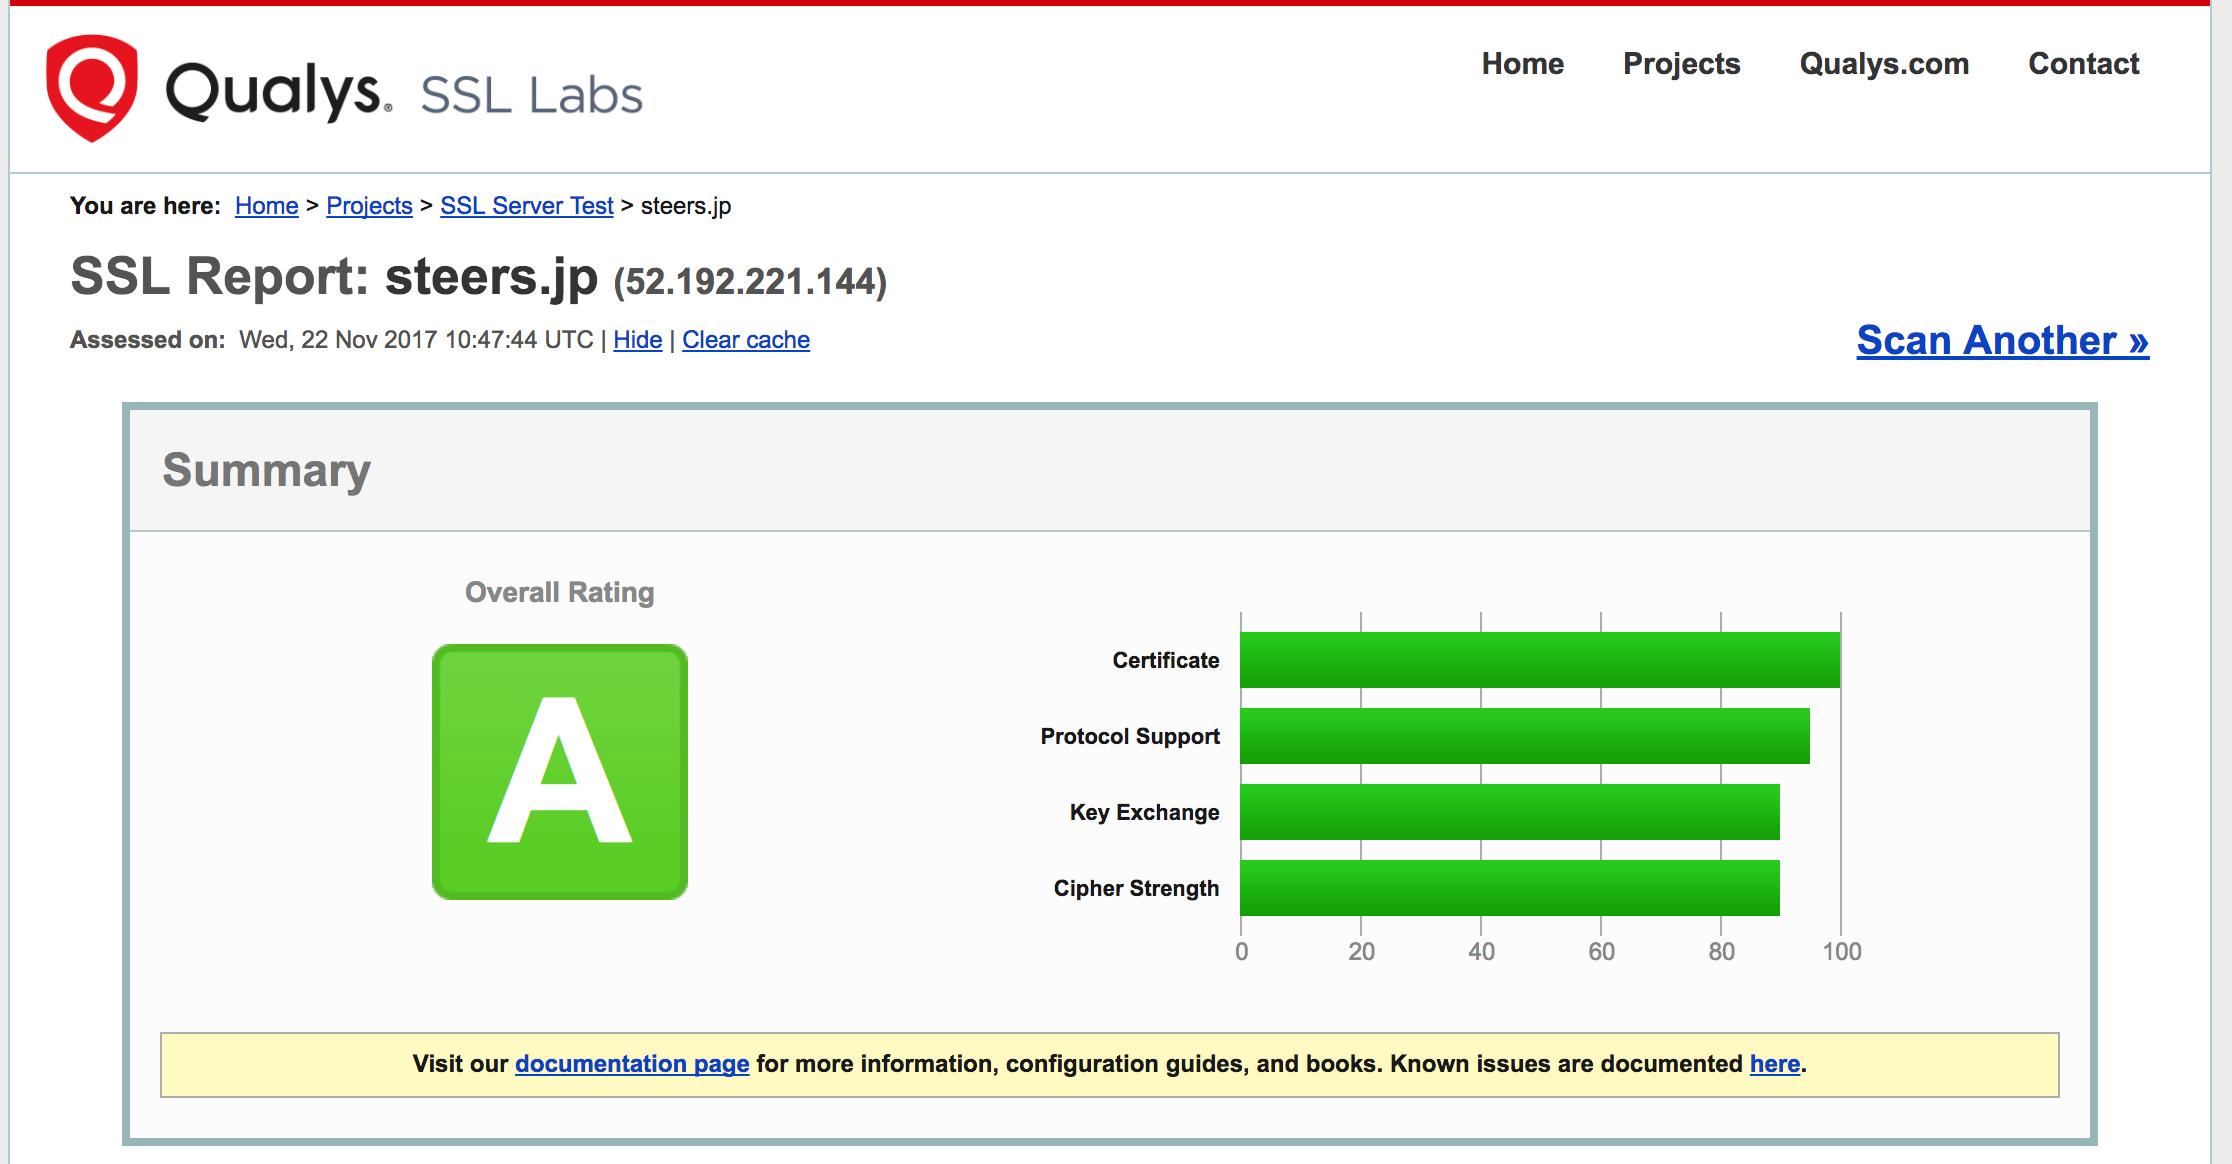 Qualys SSL LabsのSummaryもA